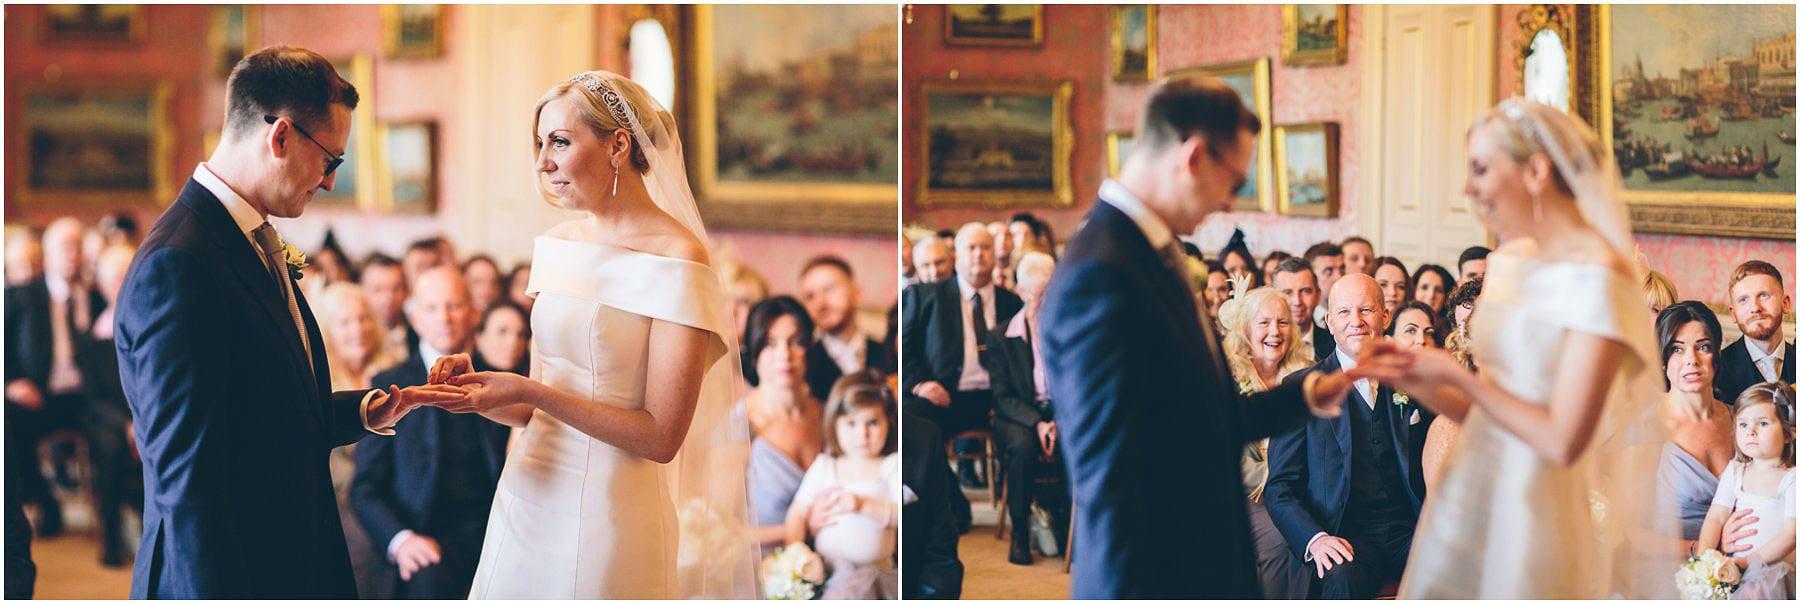 Capesthorne_Hall_Wedding_Photography_0048